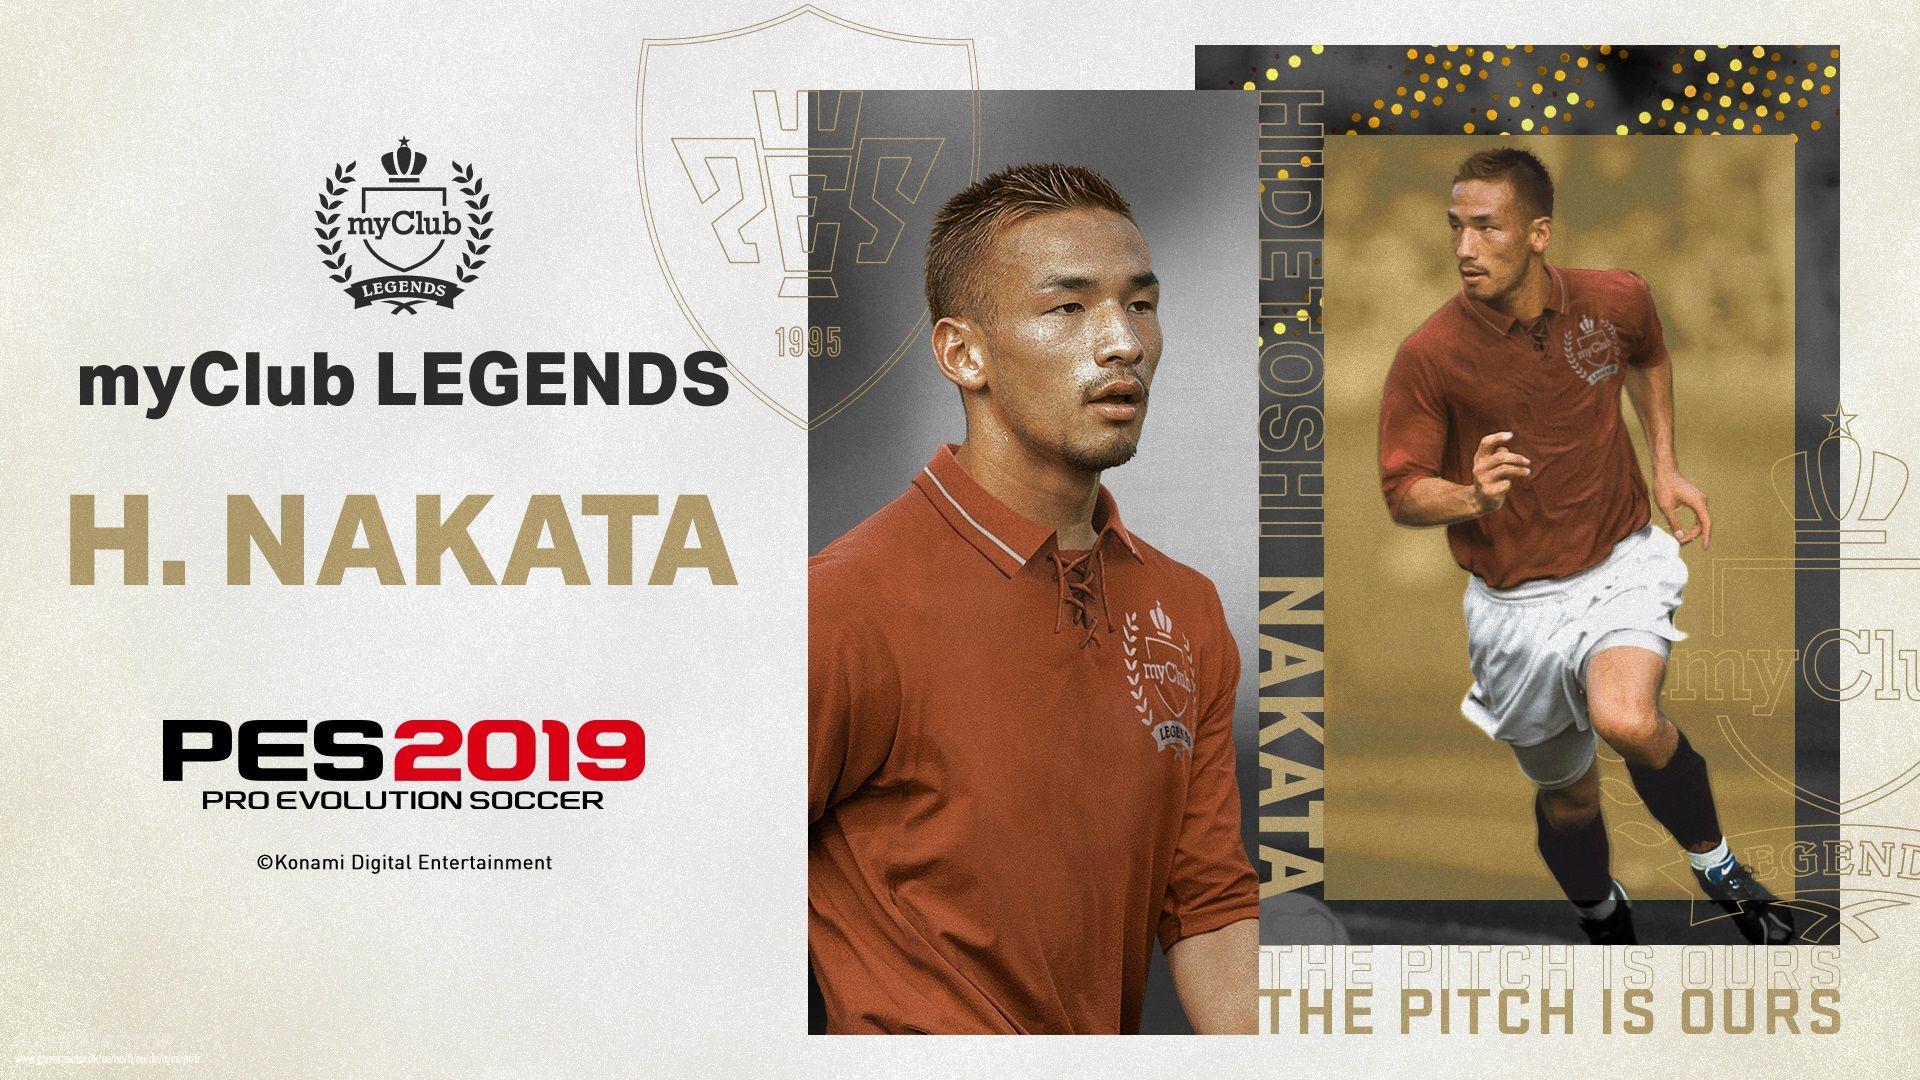 Francesco Totti among new legends added to PES 2019 - Pro Evolution